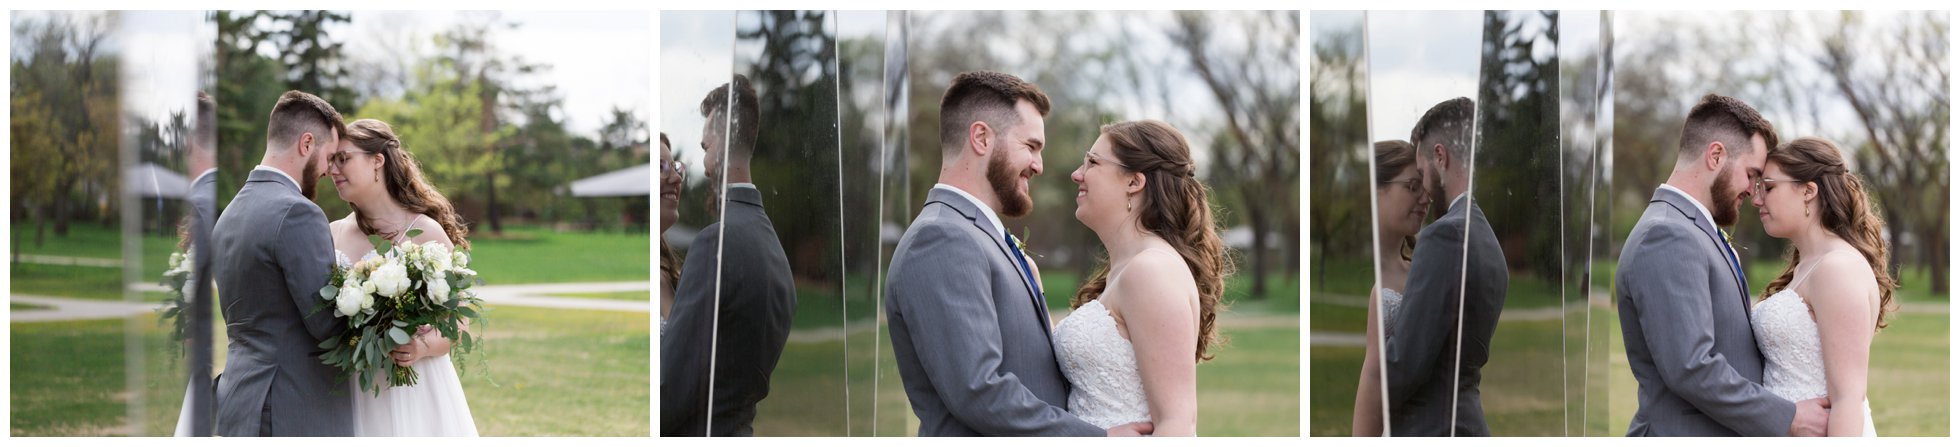 Emily and Royden Edmonton Wedding (Life by Selena Photography)_0032.jpg